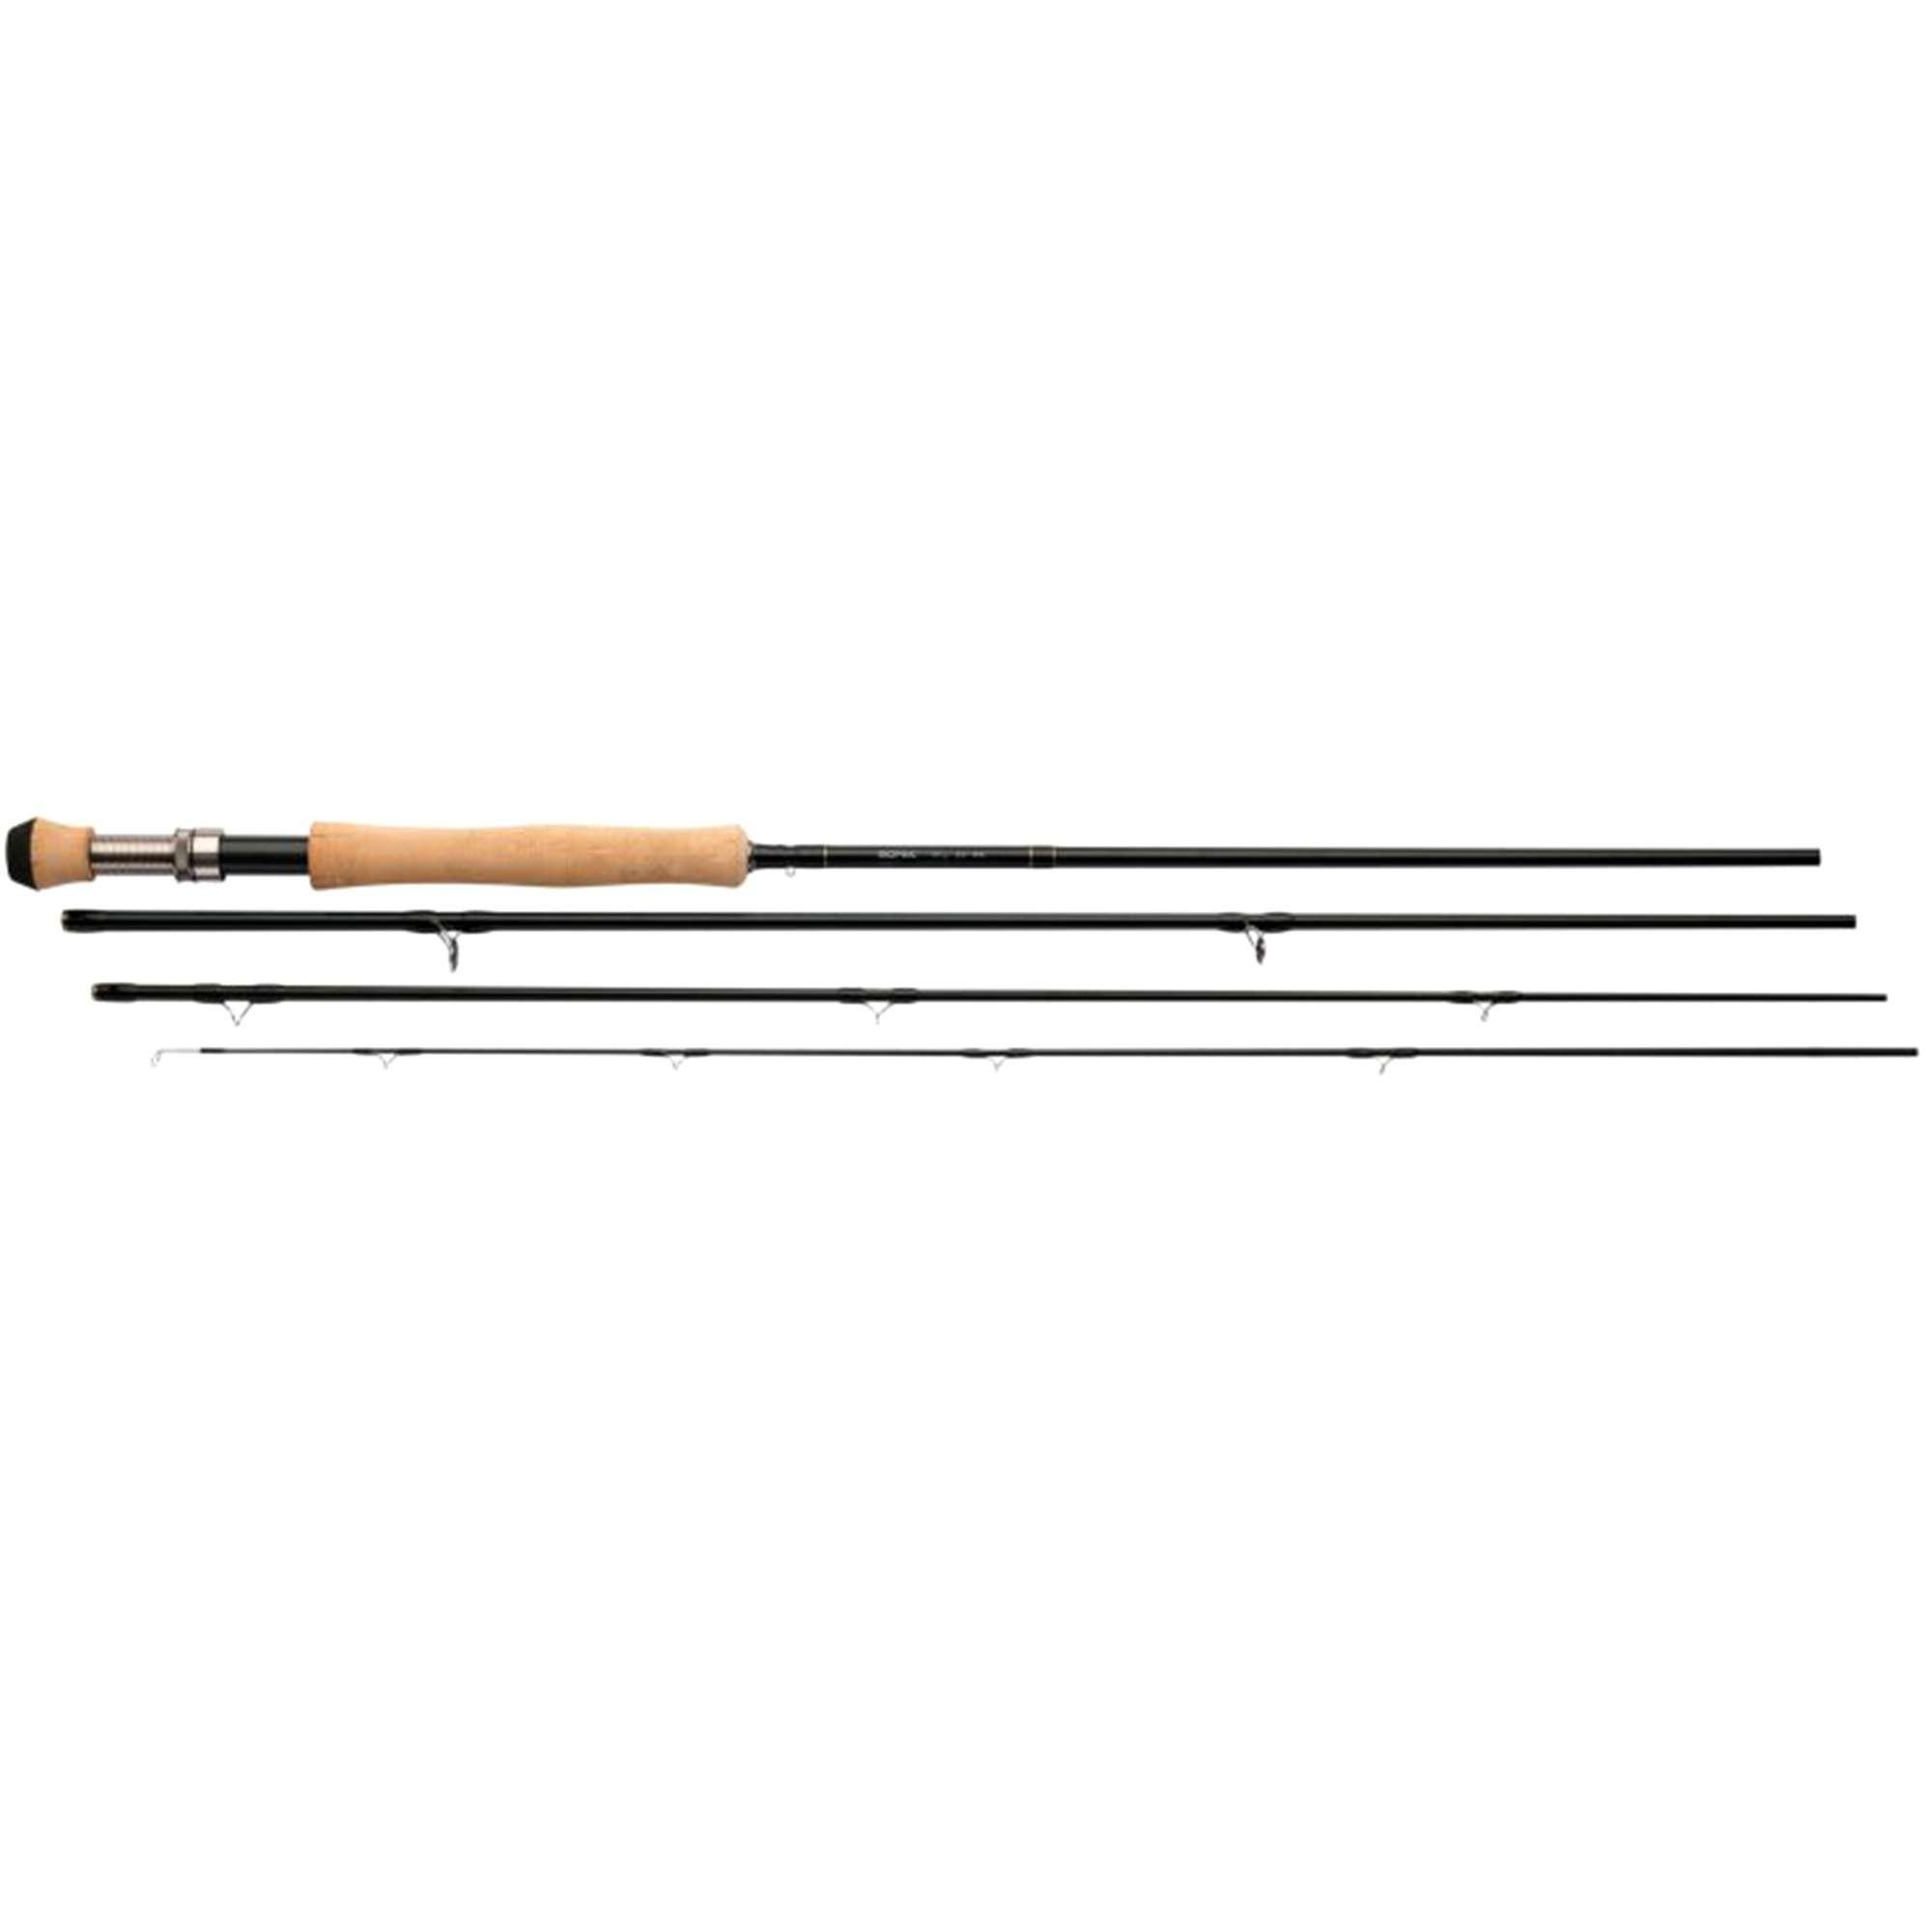 SONIK SKS Fly (4 piece) 8ft Rod